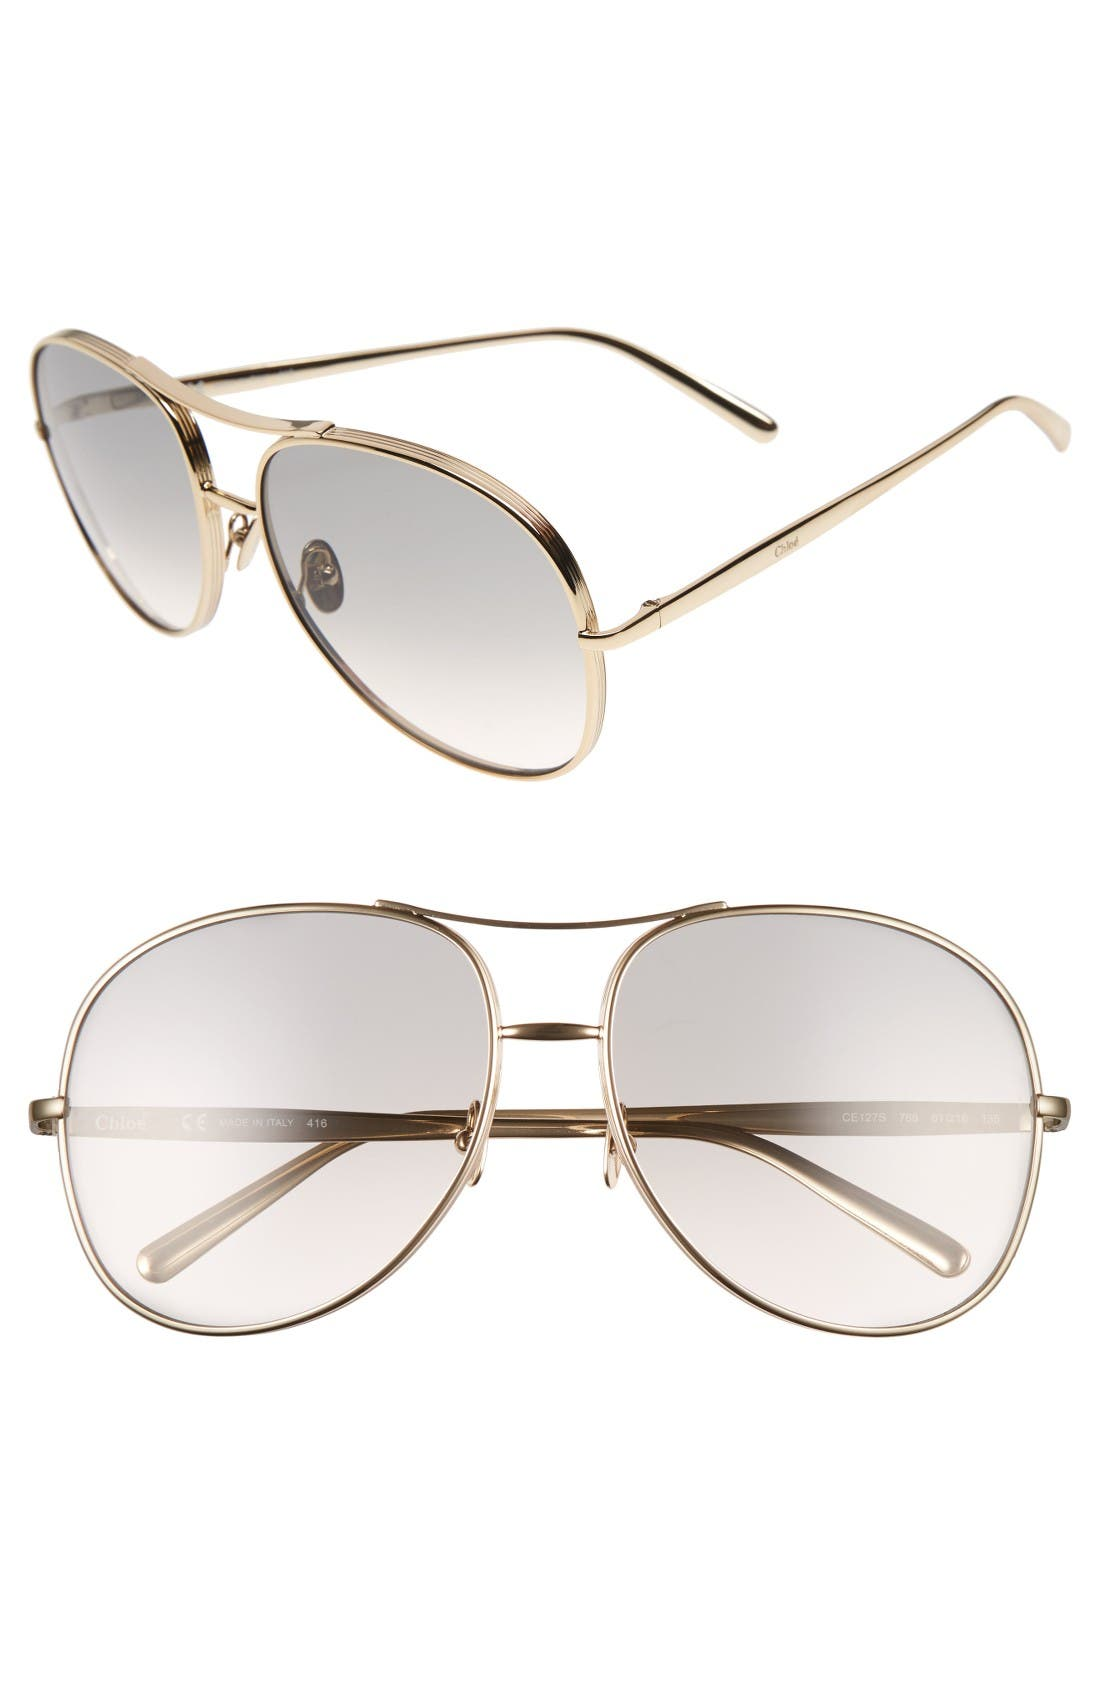 Chloé 61mm Oversize Sunglasses